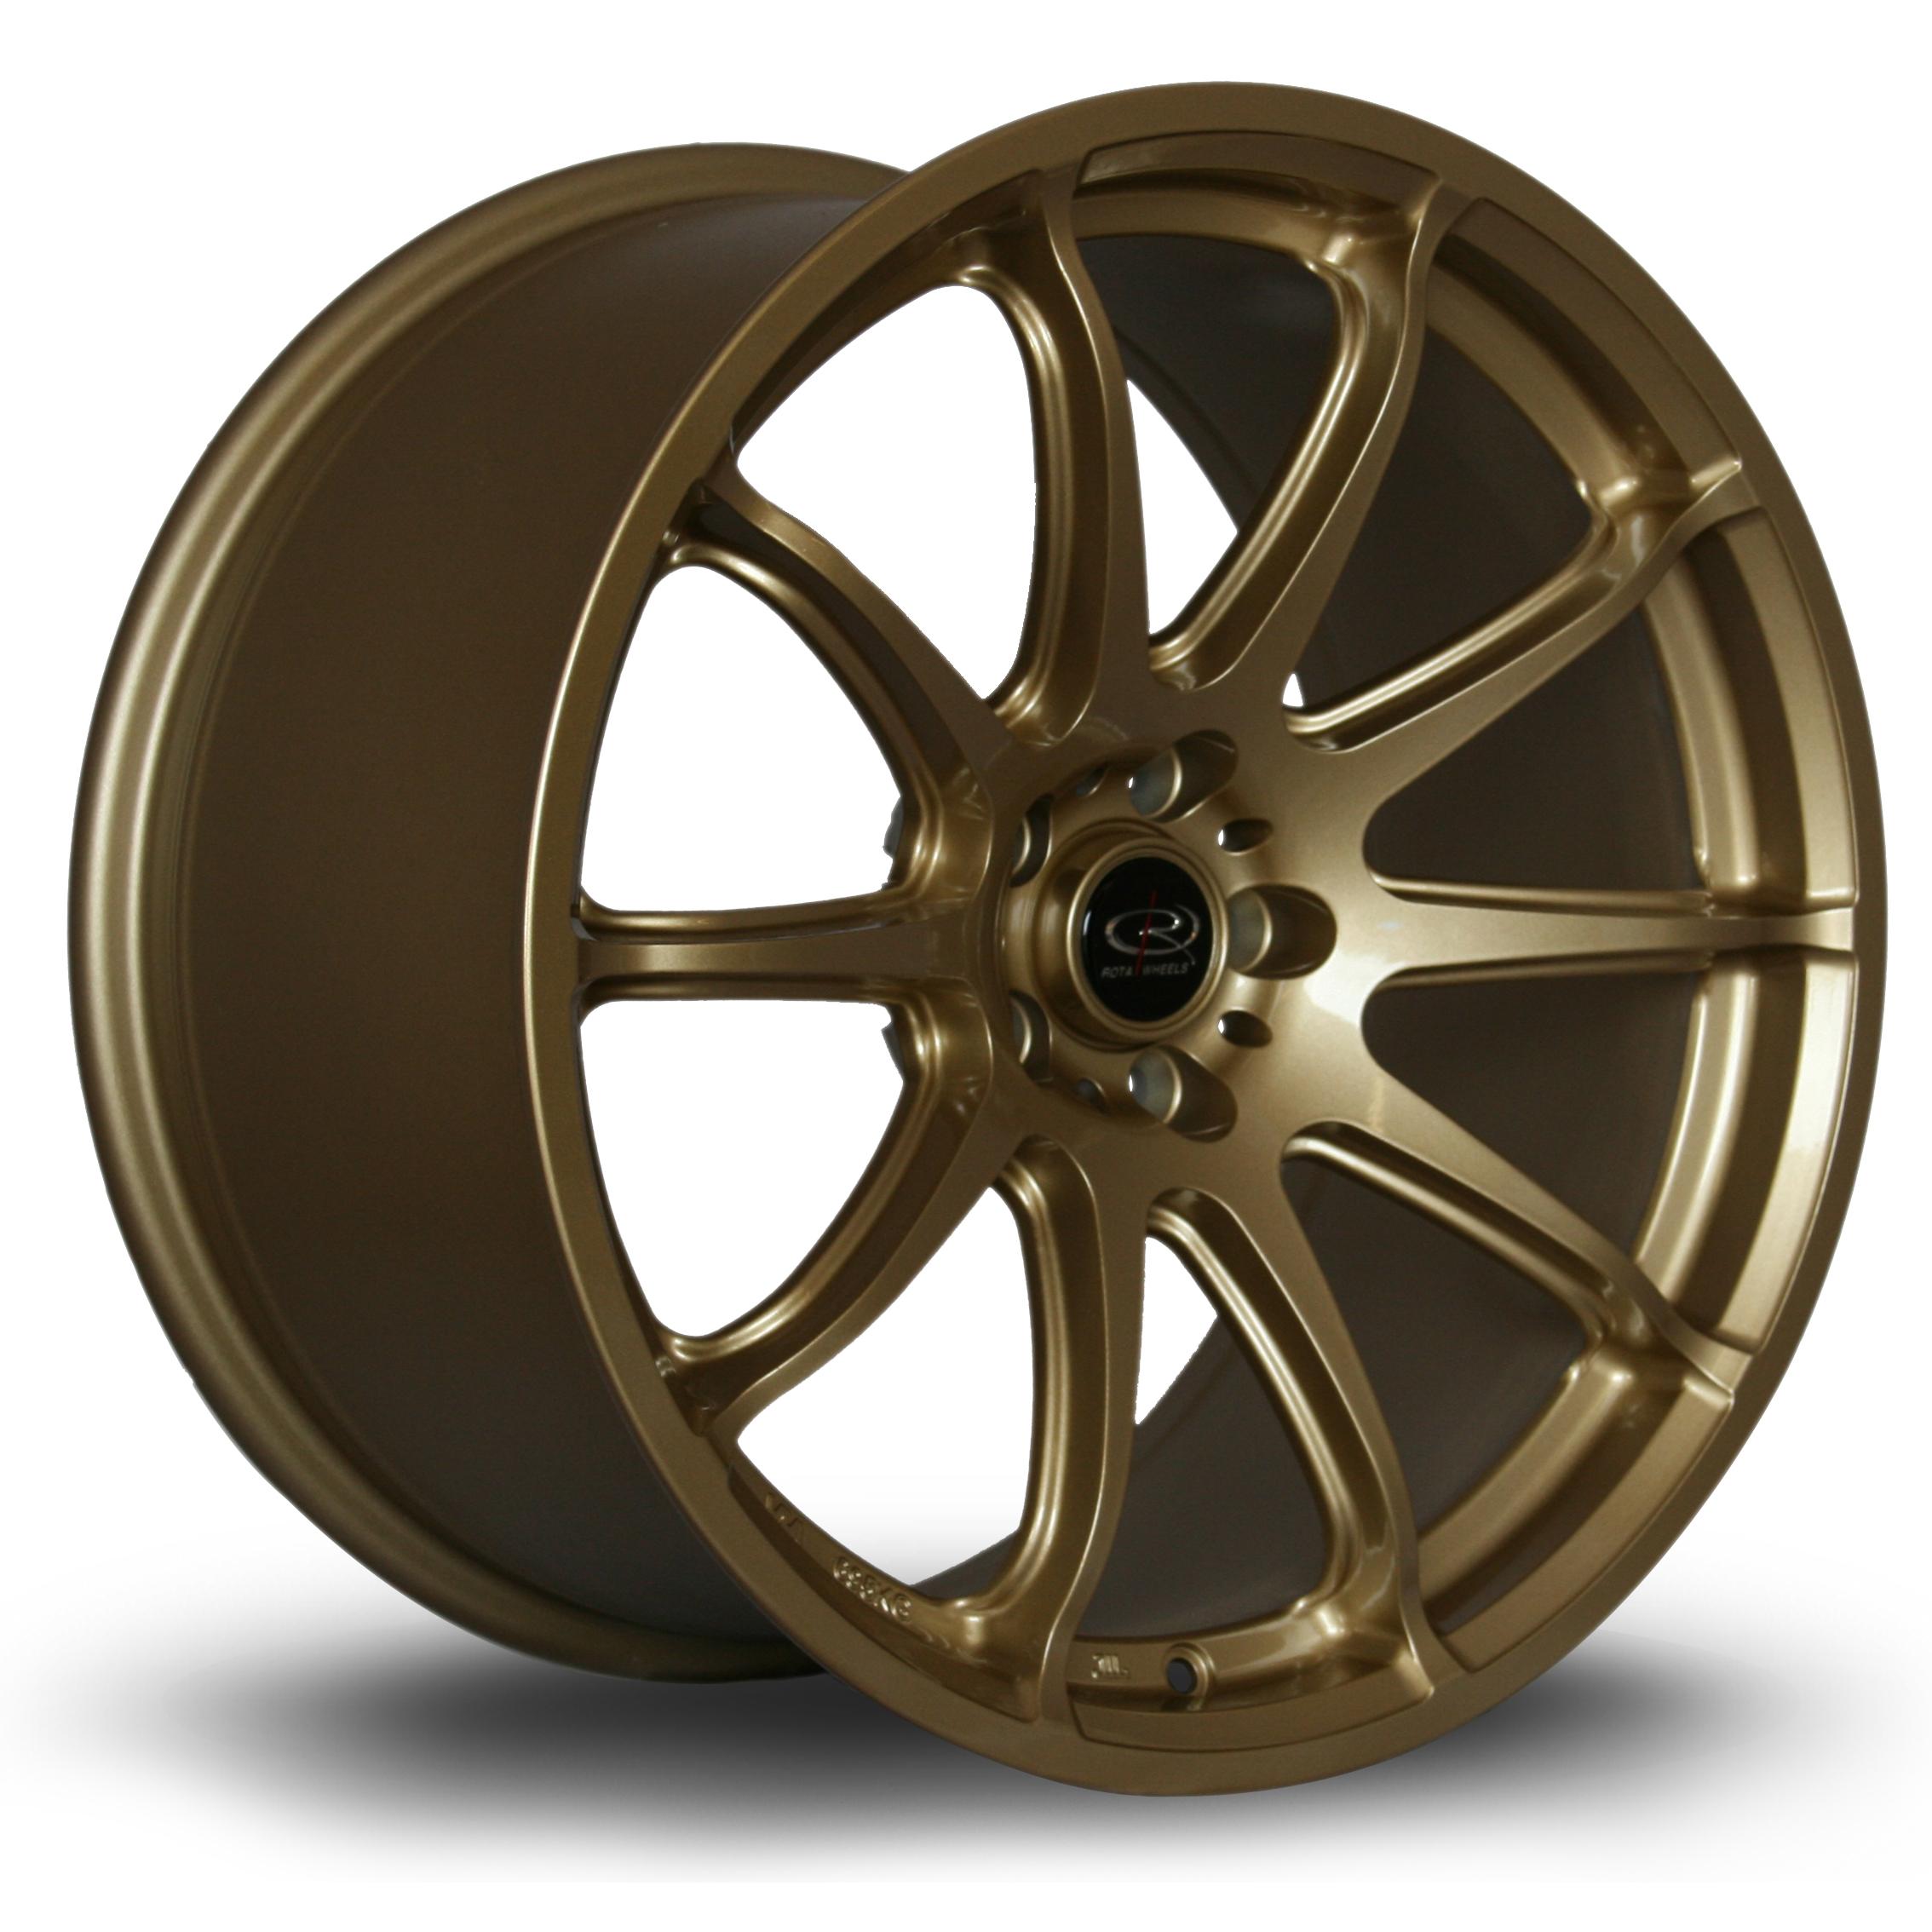 ROTA T2R hliníkové disky 9,5x18 5x100 ET38 Gold